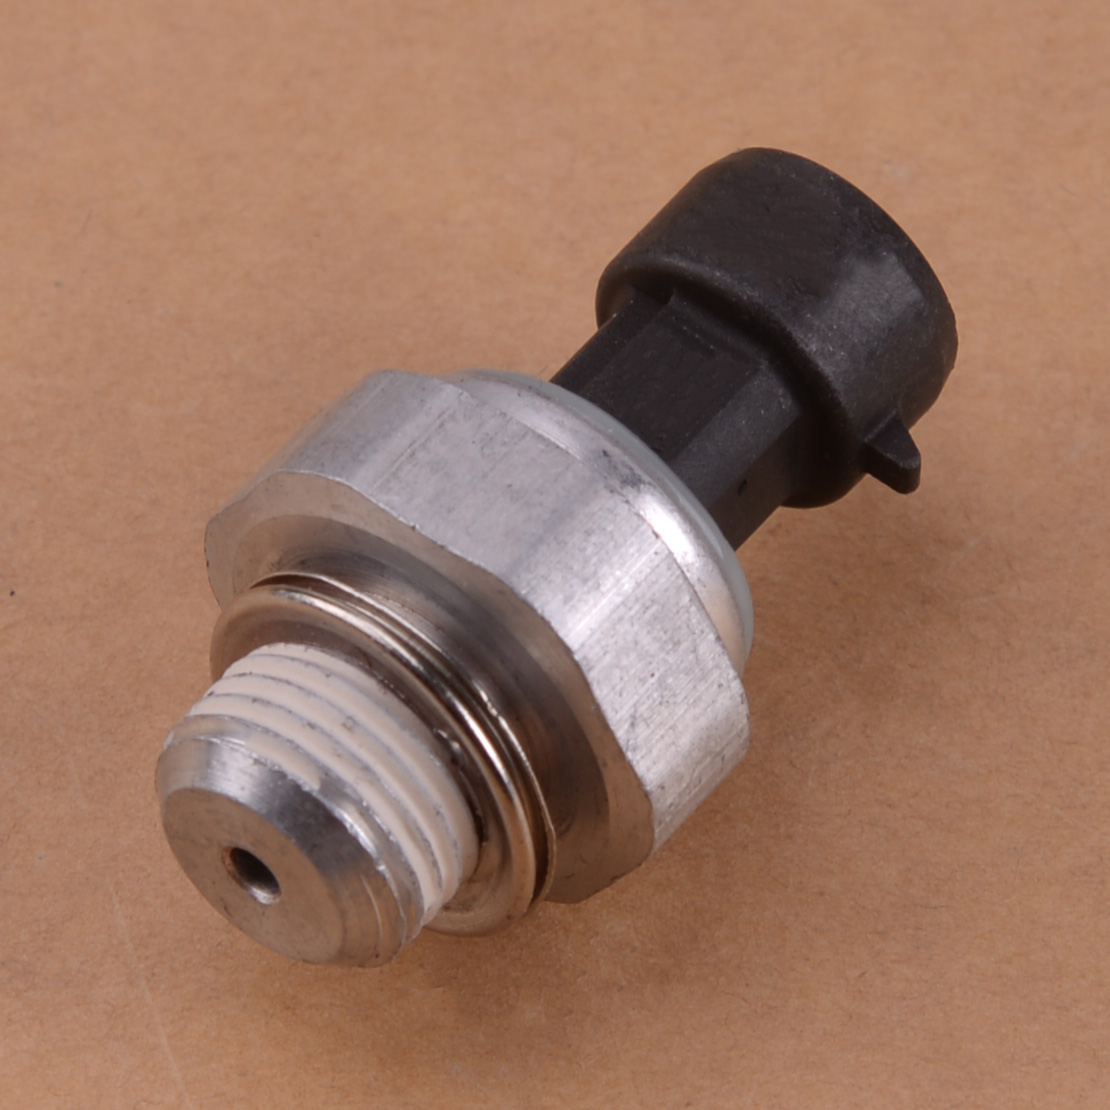 Automobiles & Motorcycles Discreet Dwcx Oil Fuel Pressure Sensor Sender Switch S4202 D1846a Fit For Chevrolet Silverado 1500 2500 3500 Gauge Spacer 12616646